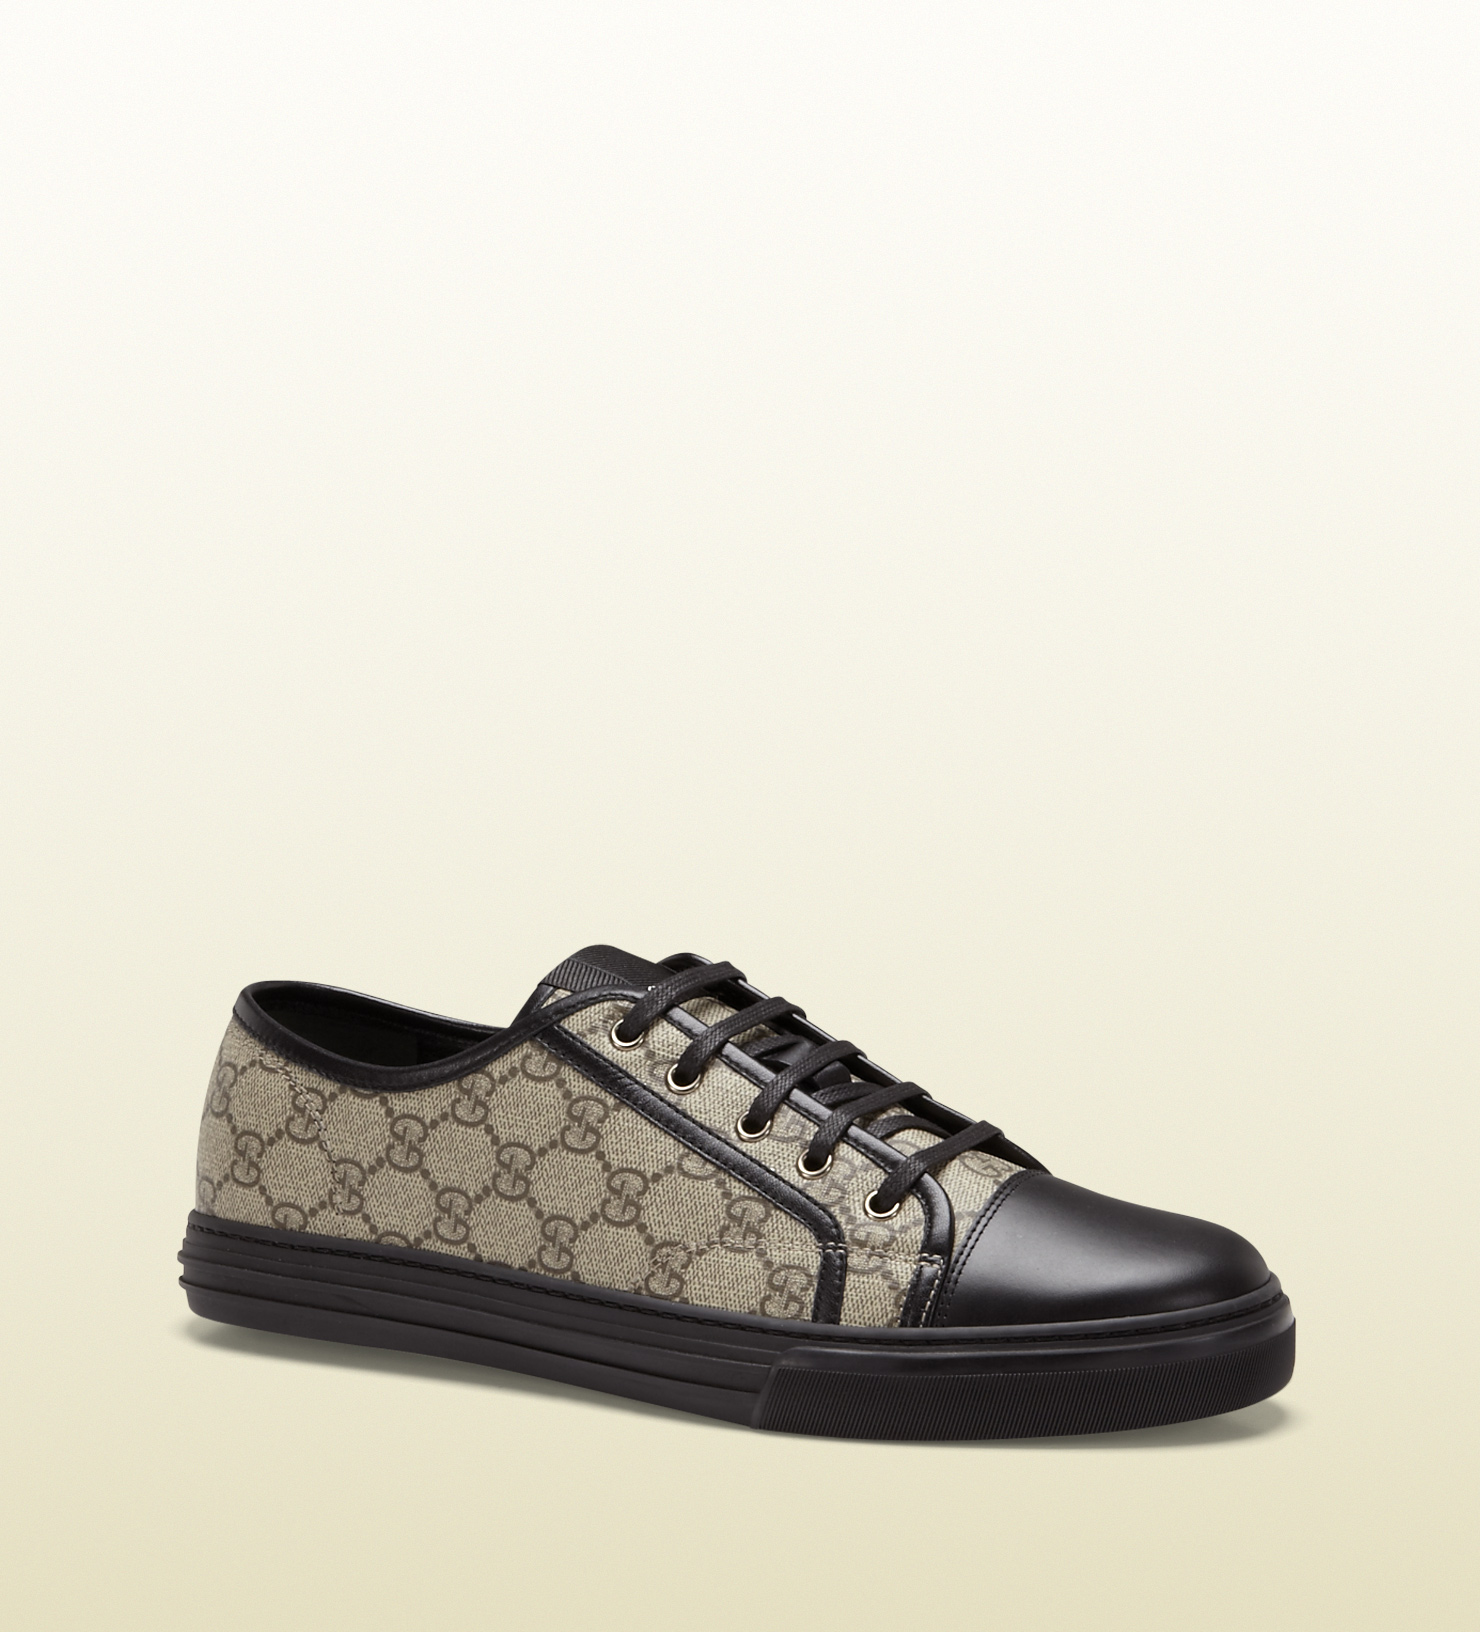 f02c932ebe6 Lyst - Gucci Gg Supreme Canvas Lowtop Sneaker in Black for Men